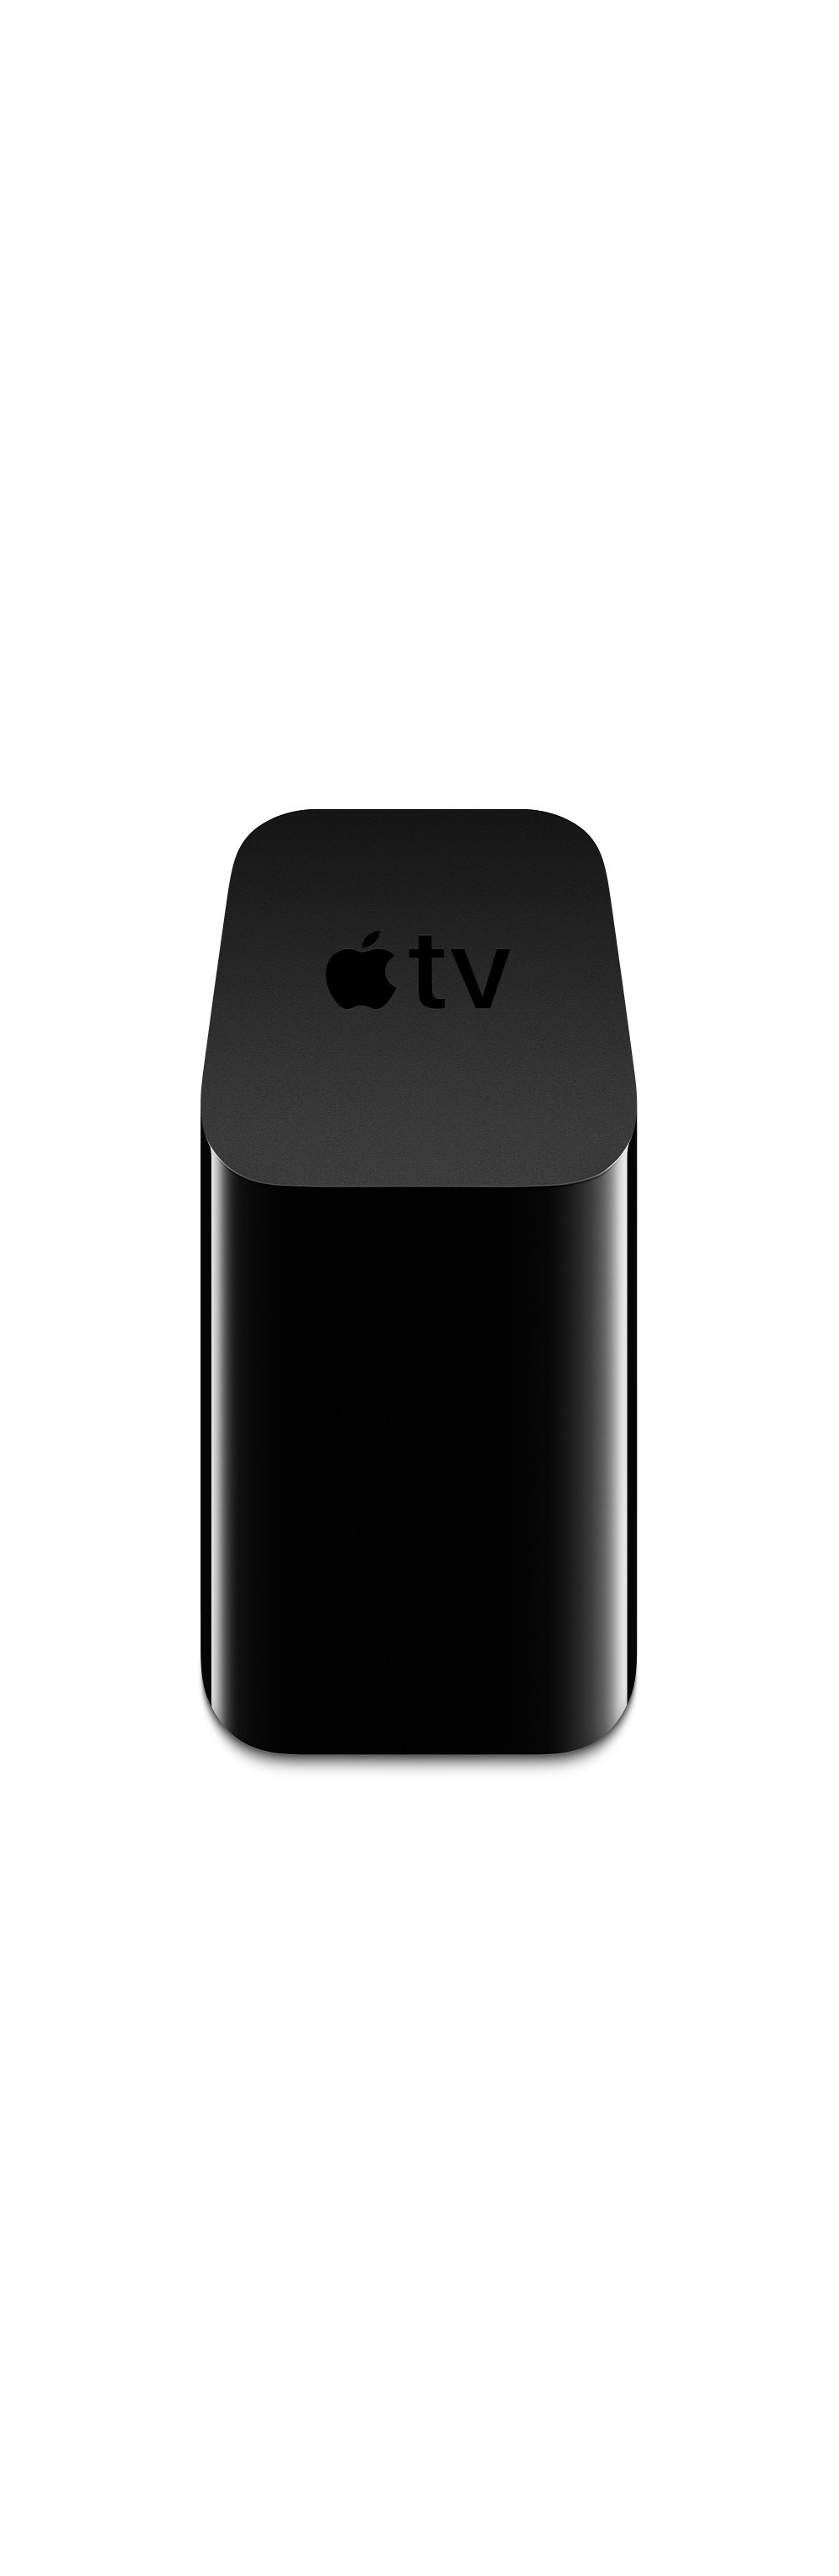 Apple TV Digital 4K A1842 32GB